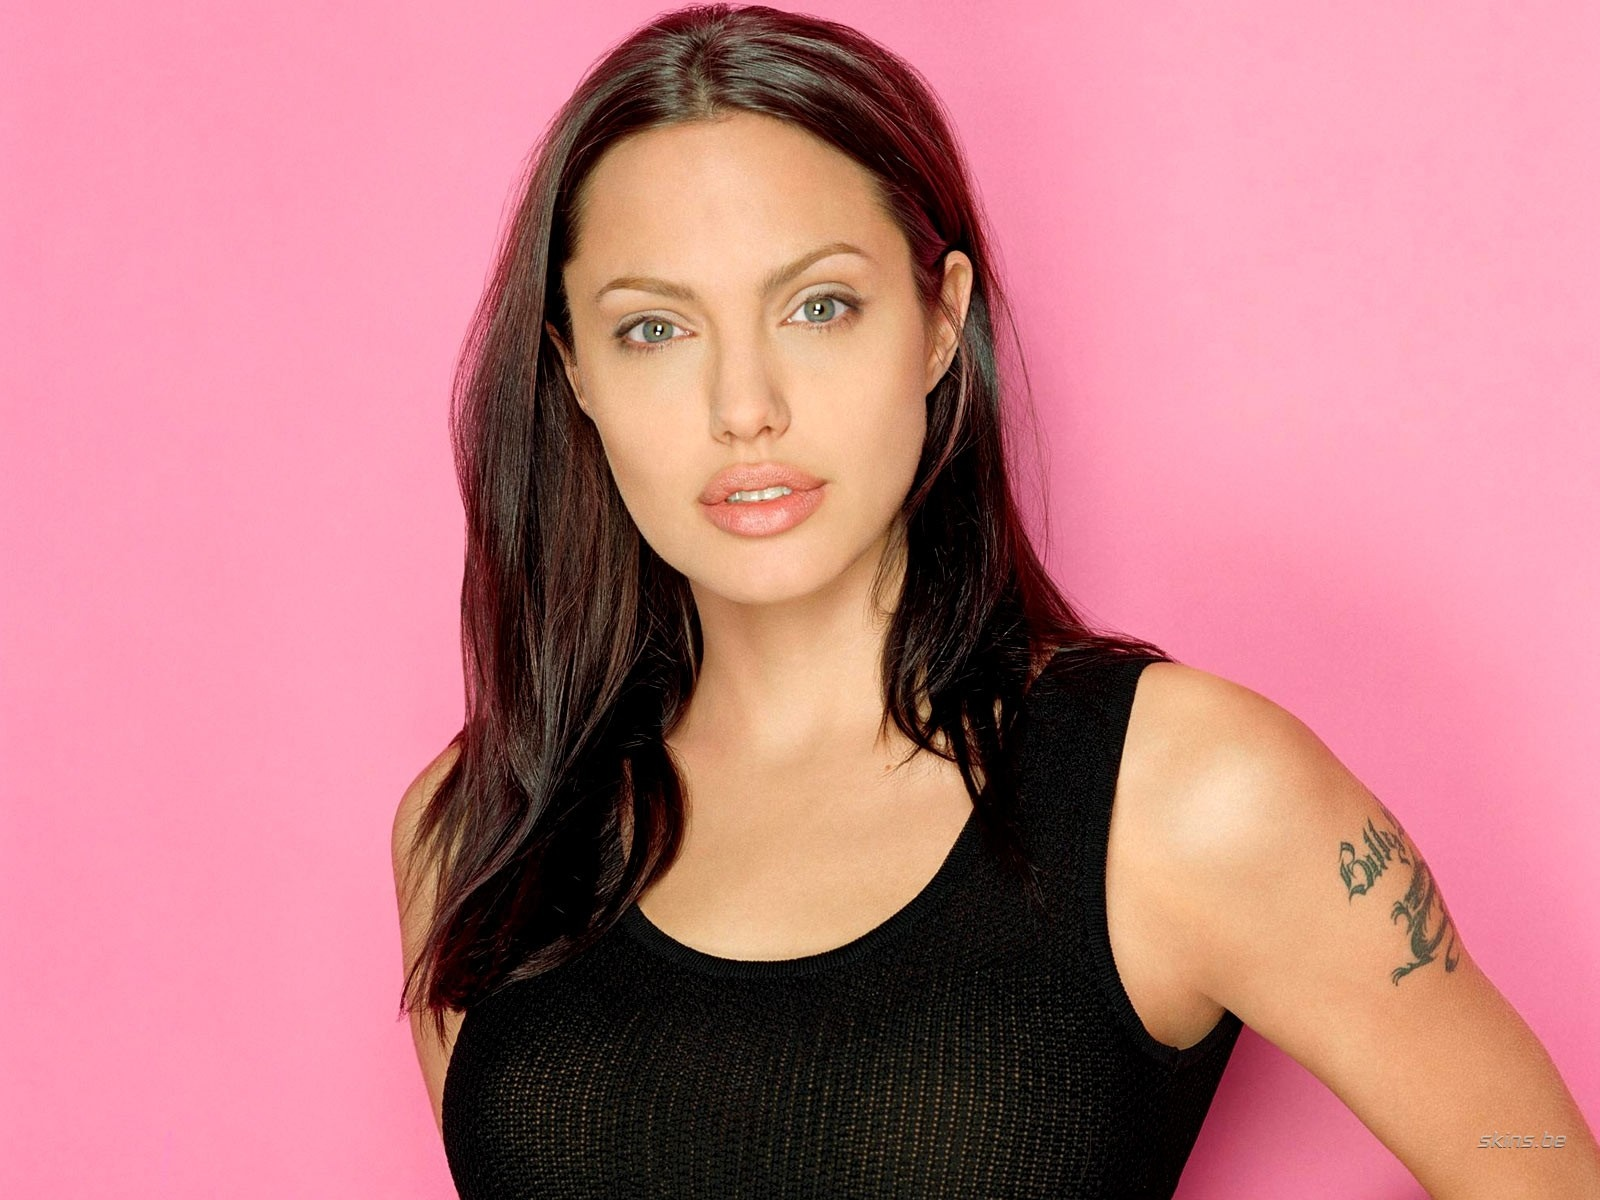 Angelina jolie in lara croft tomb raider the cradle of life 2005 - 1 6